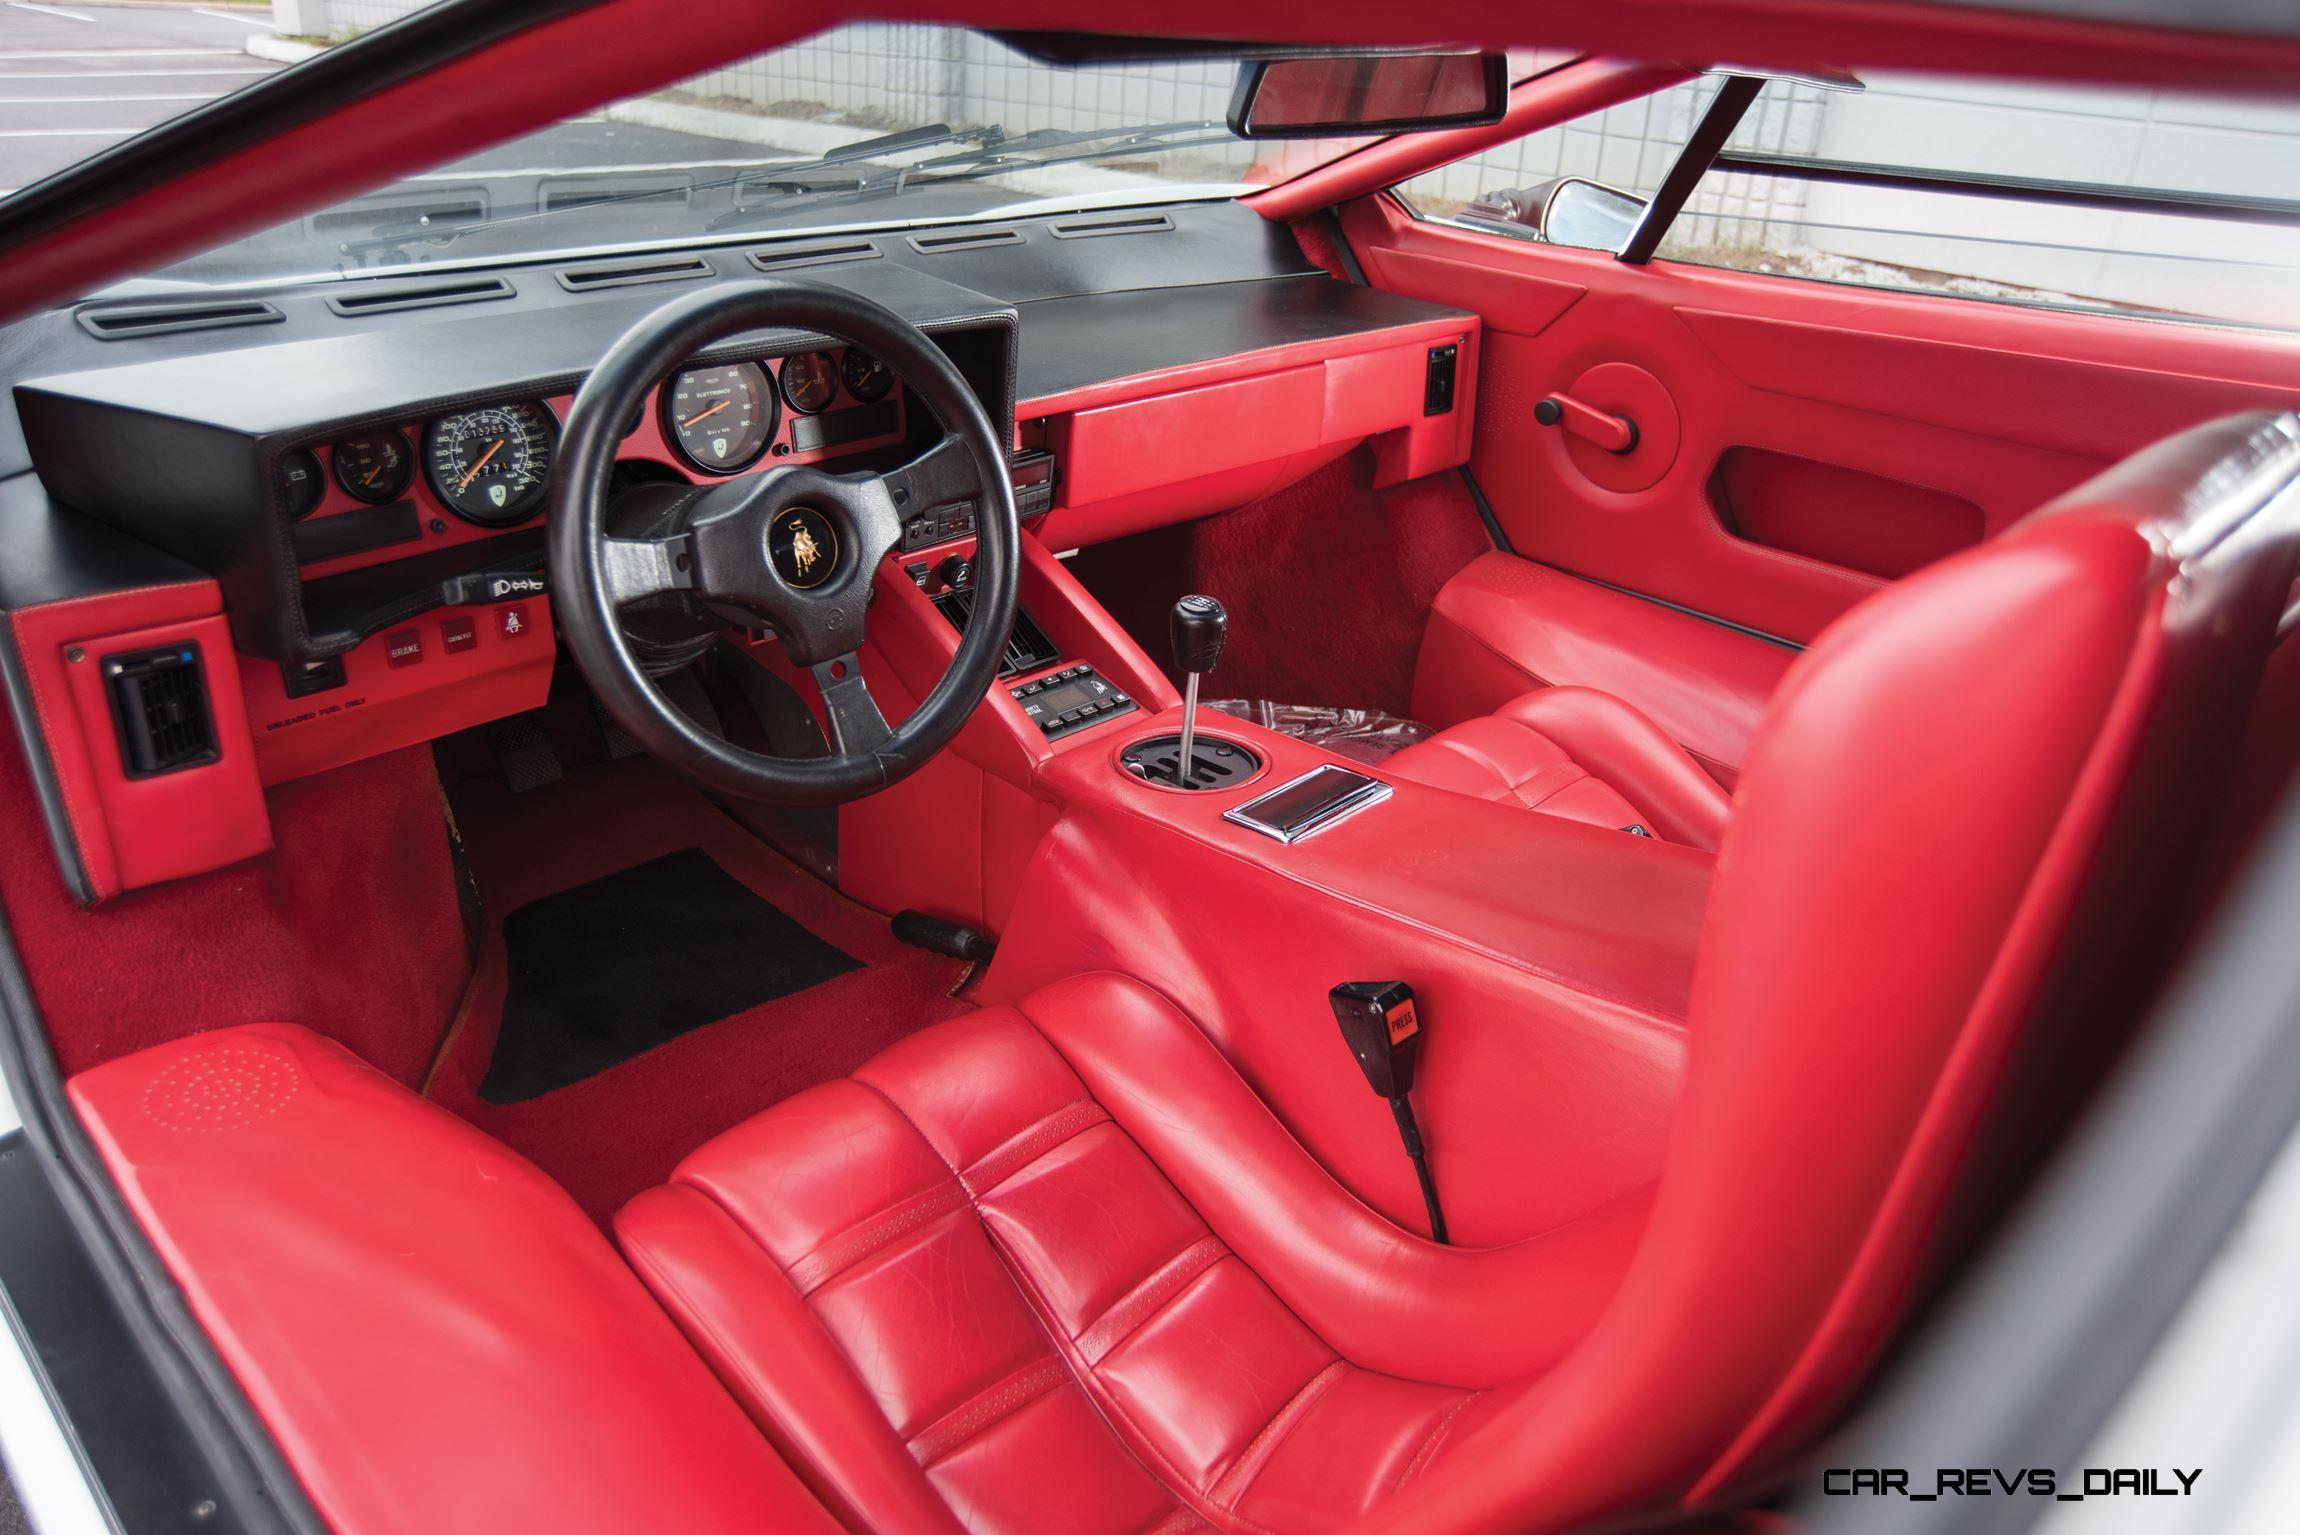 1988 5 Lamborghini Countach 5000 Qv In Bianco White Is As